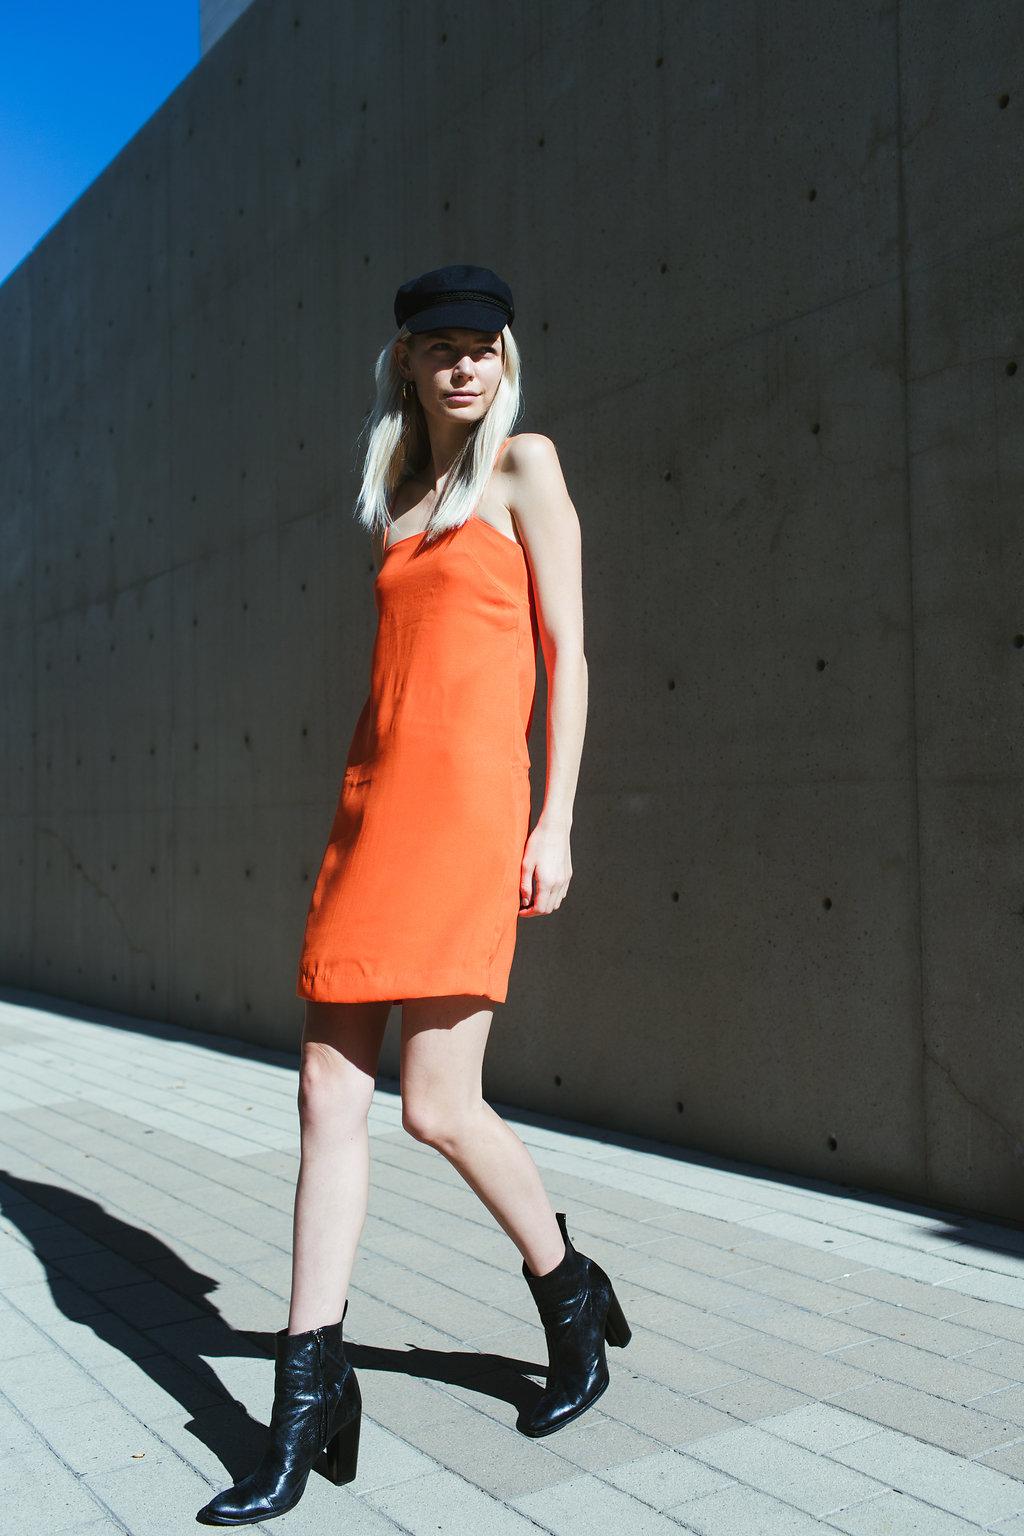 Paige-Newton-Austin-Model-Fashion-Photography0016.jpg